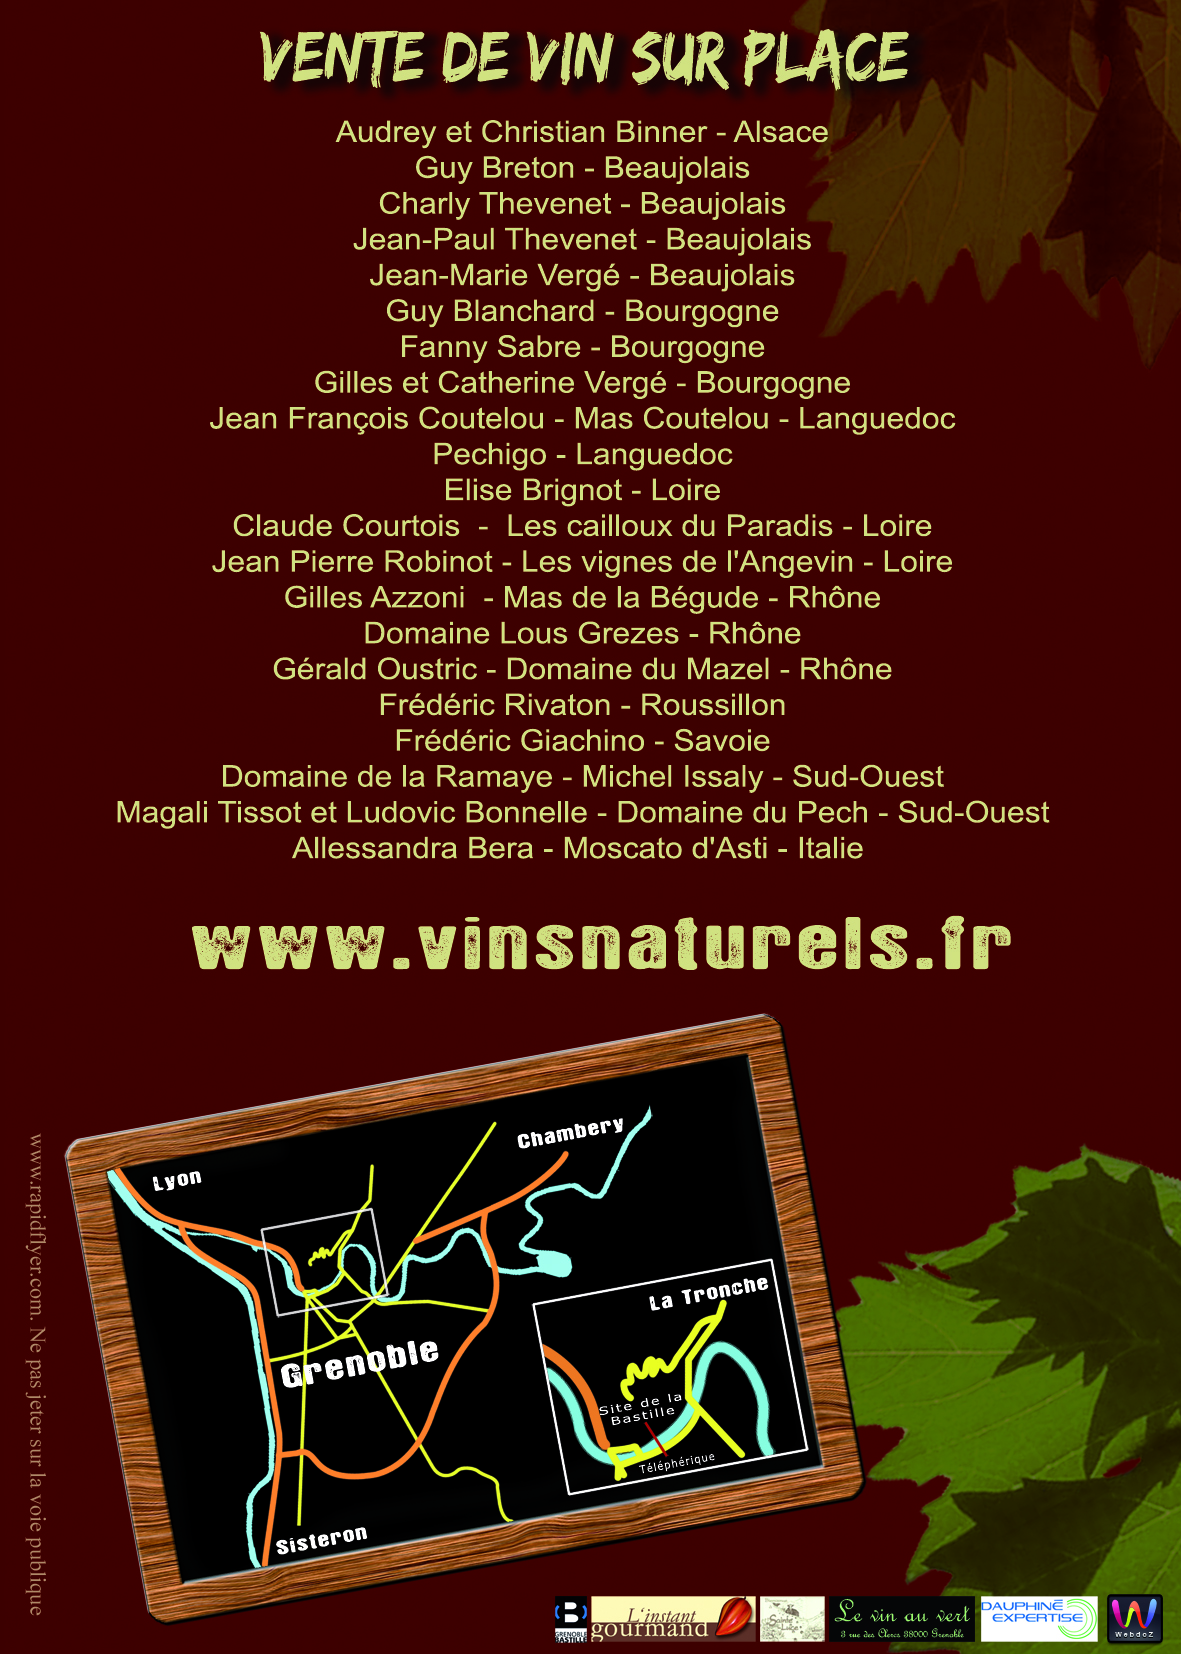 Rencontre vinsobres